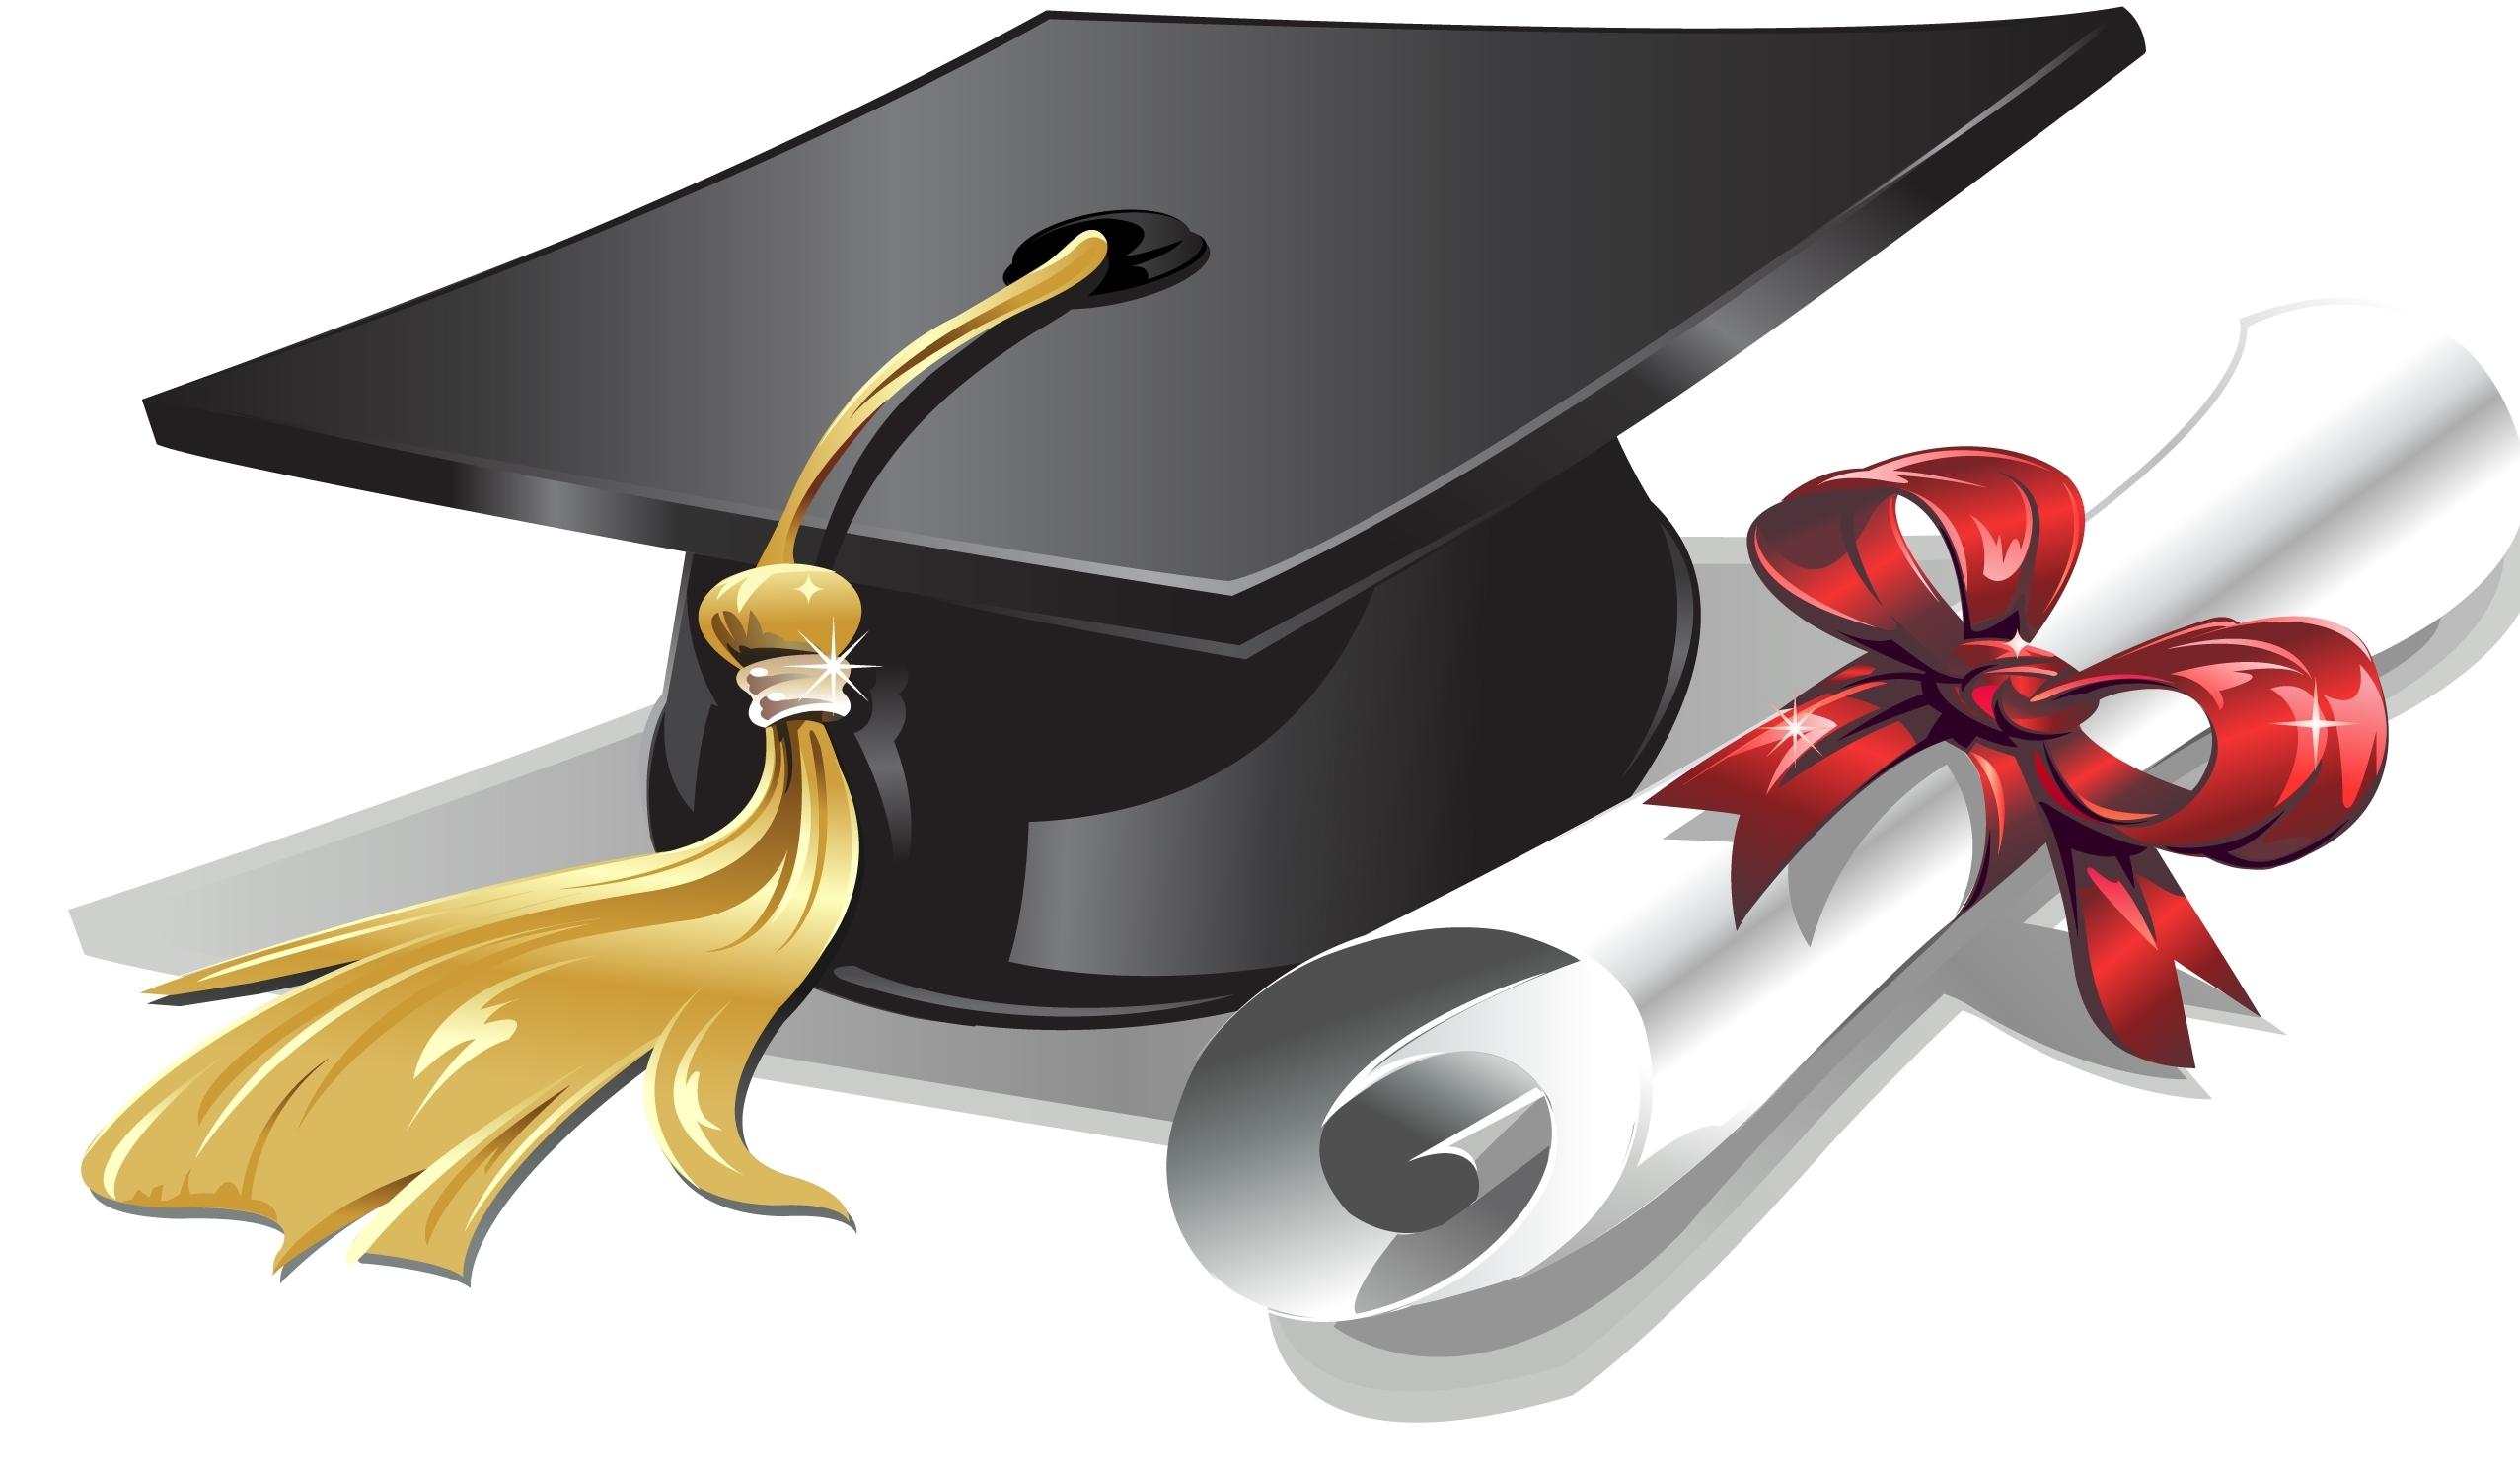 Award clip art library. Diploma clipart scholarship